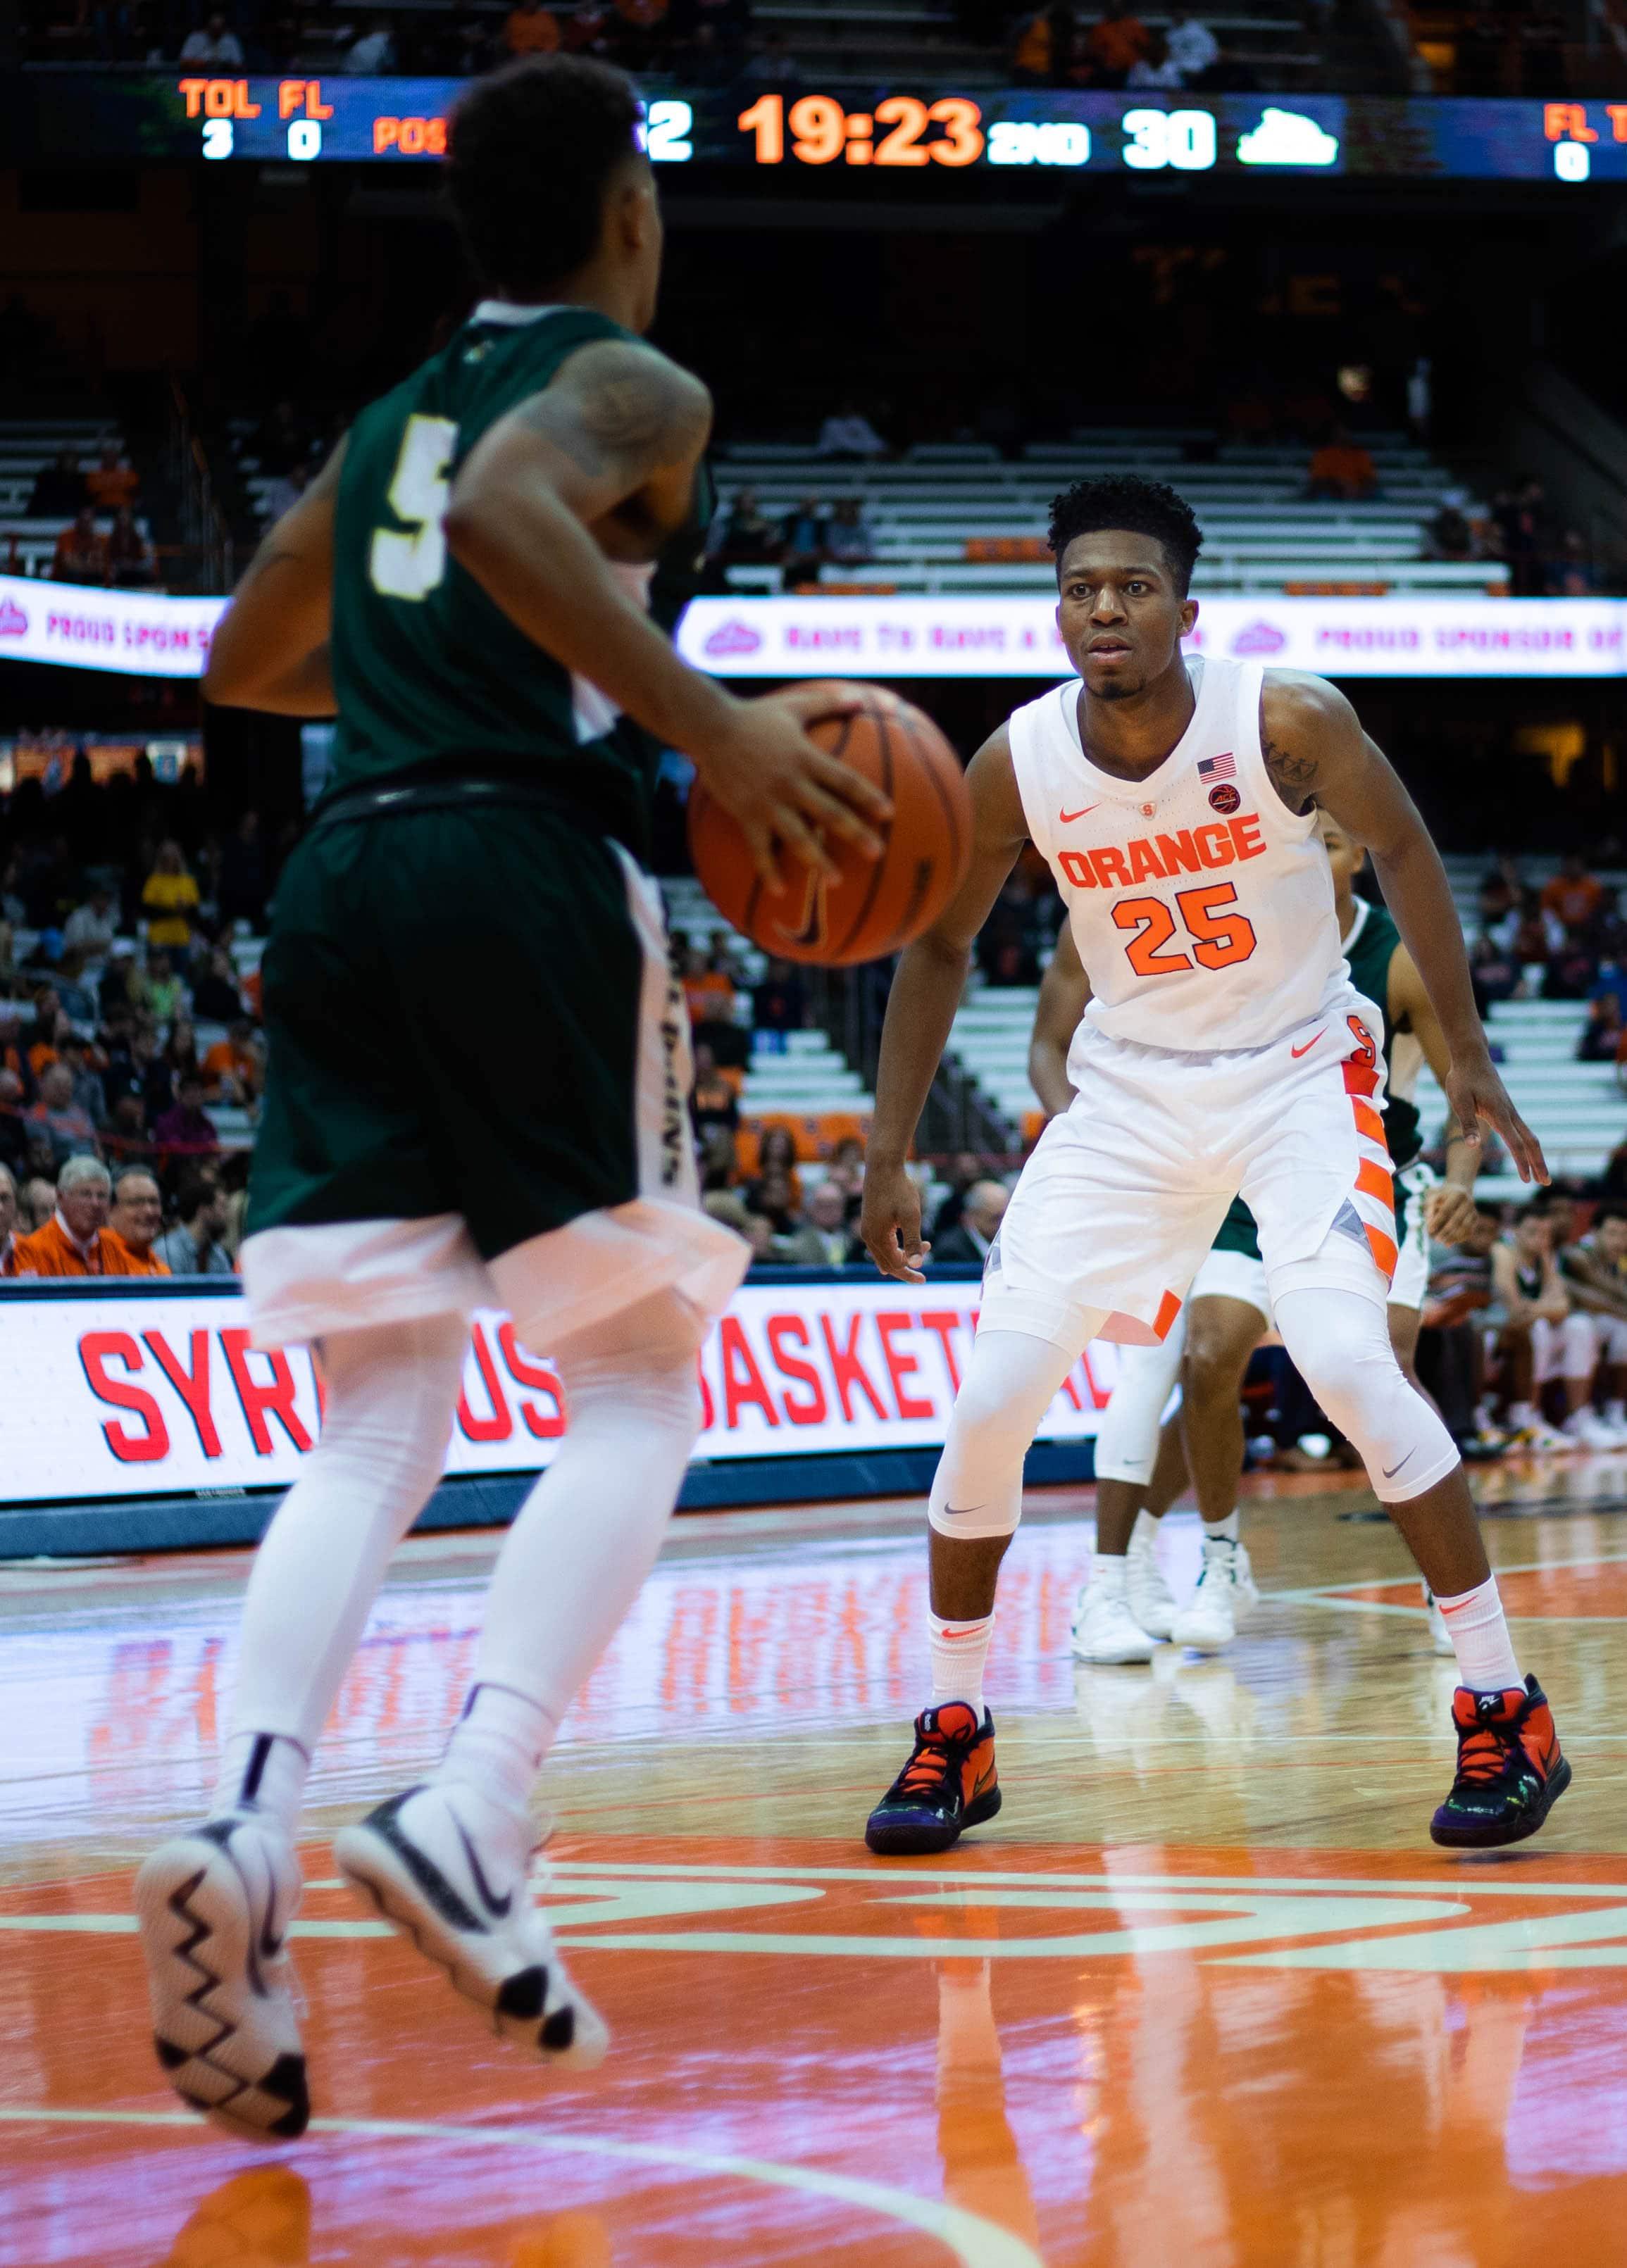 Syracuse's Tyus Battle defends Le Moyne's Malik Garner